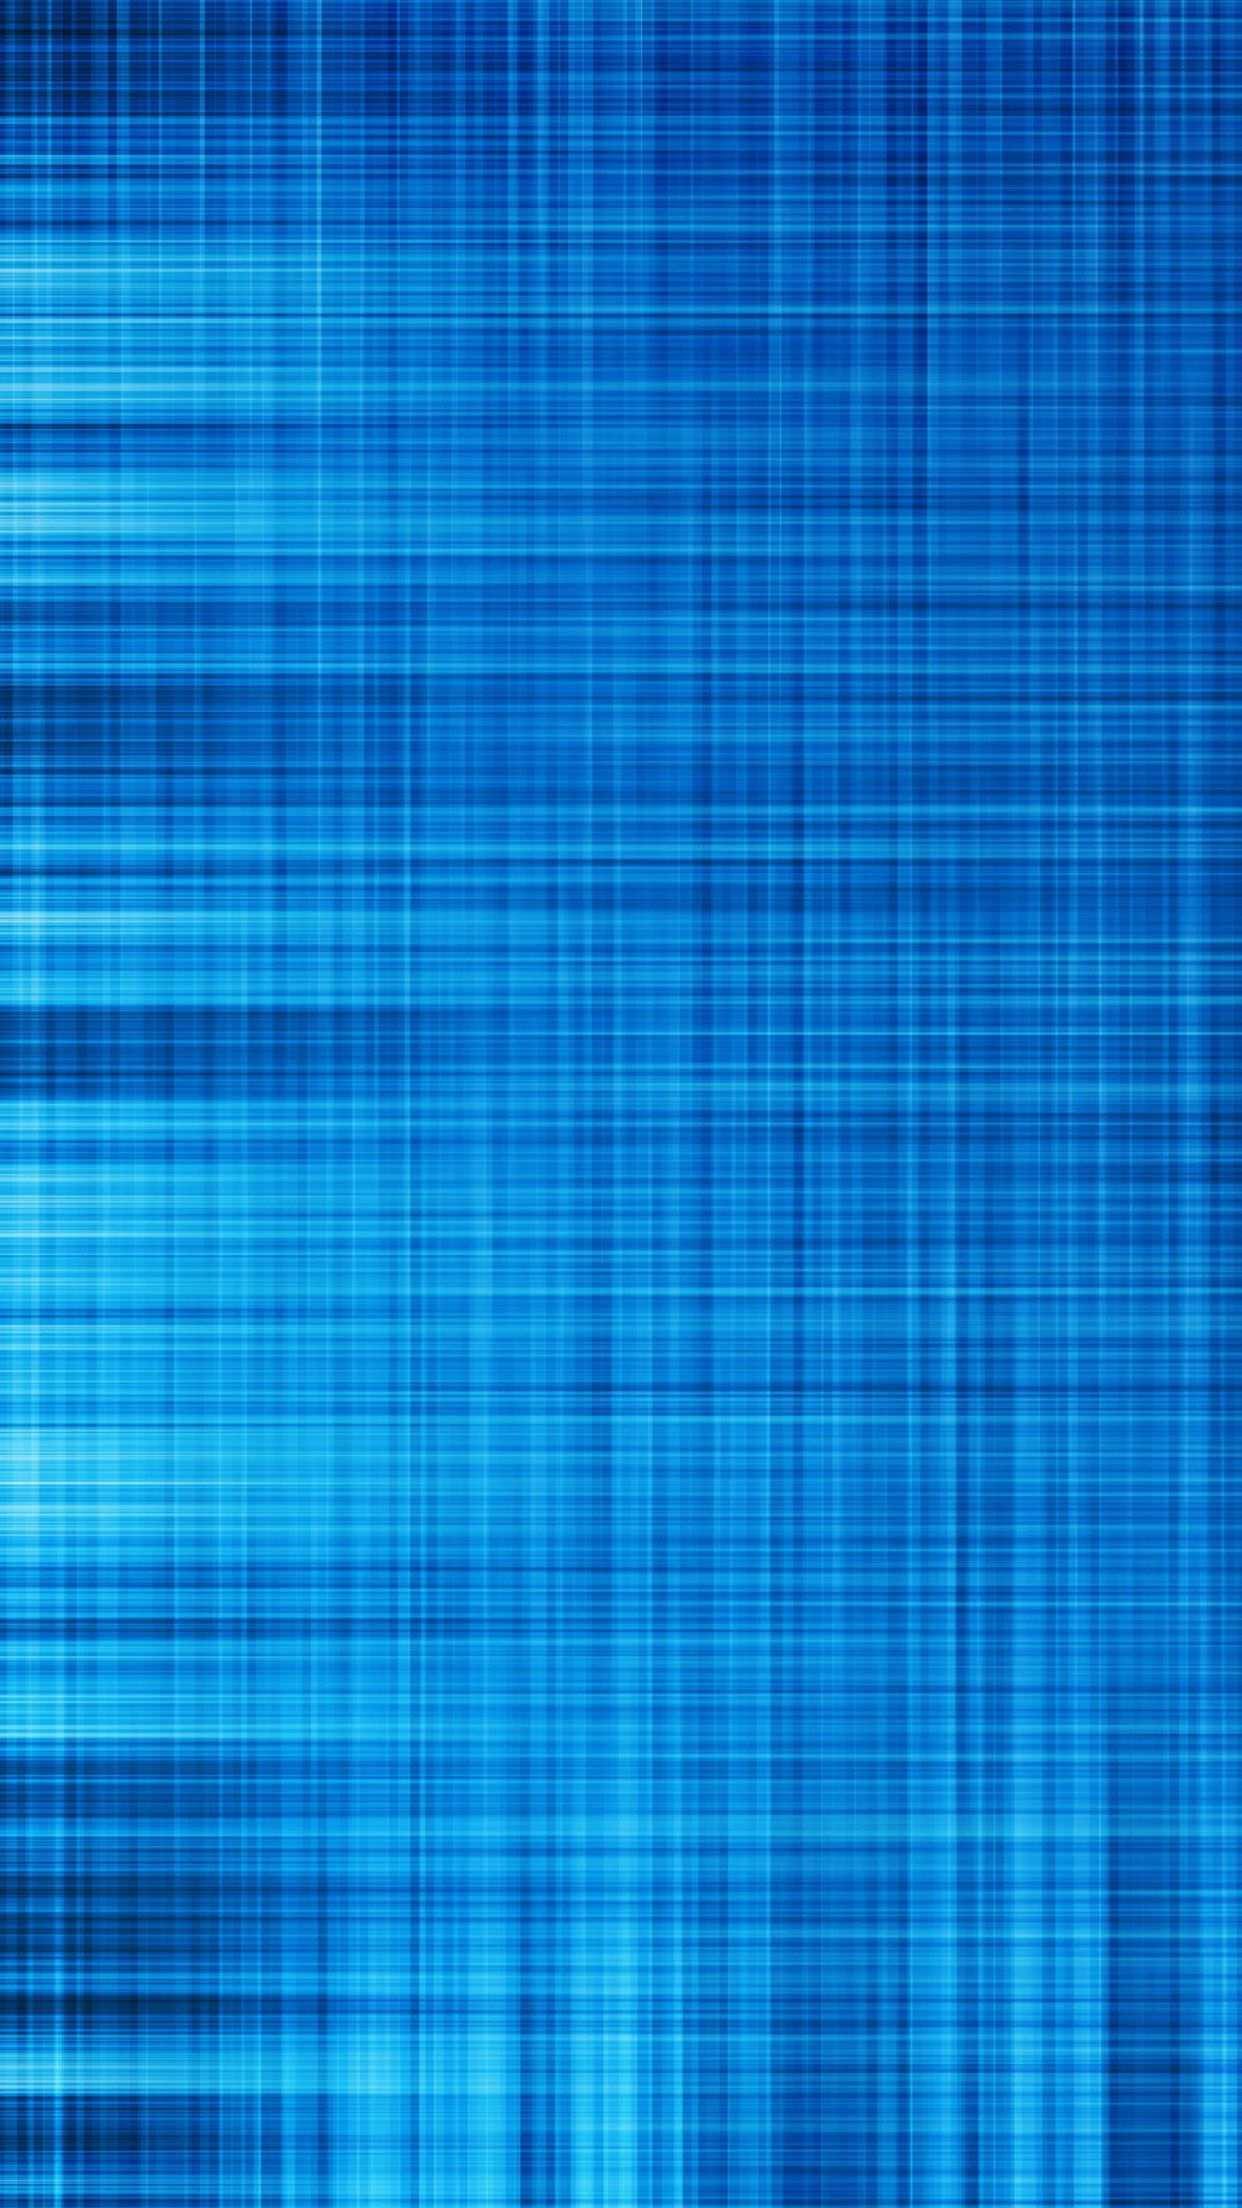 Blue Abstract Lines Wallpaper For Iphone Android Abstract Wallpaper More On Wallzapp Com Hintergrund Design Hintergrundbilder Hintergrund